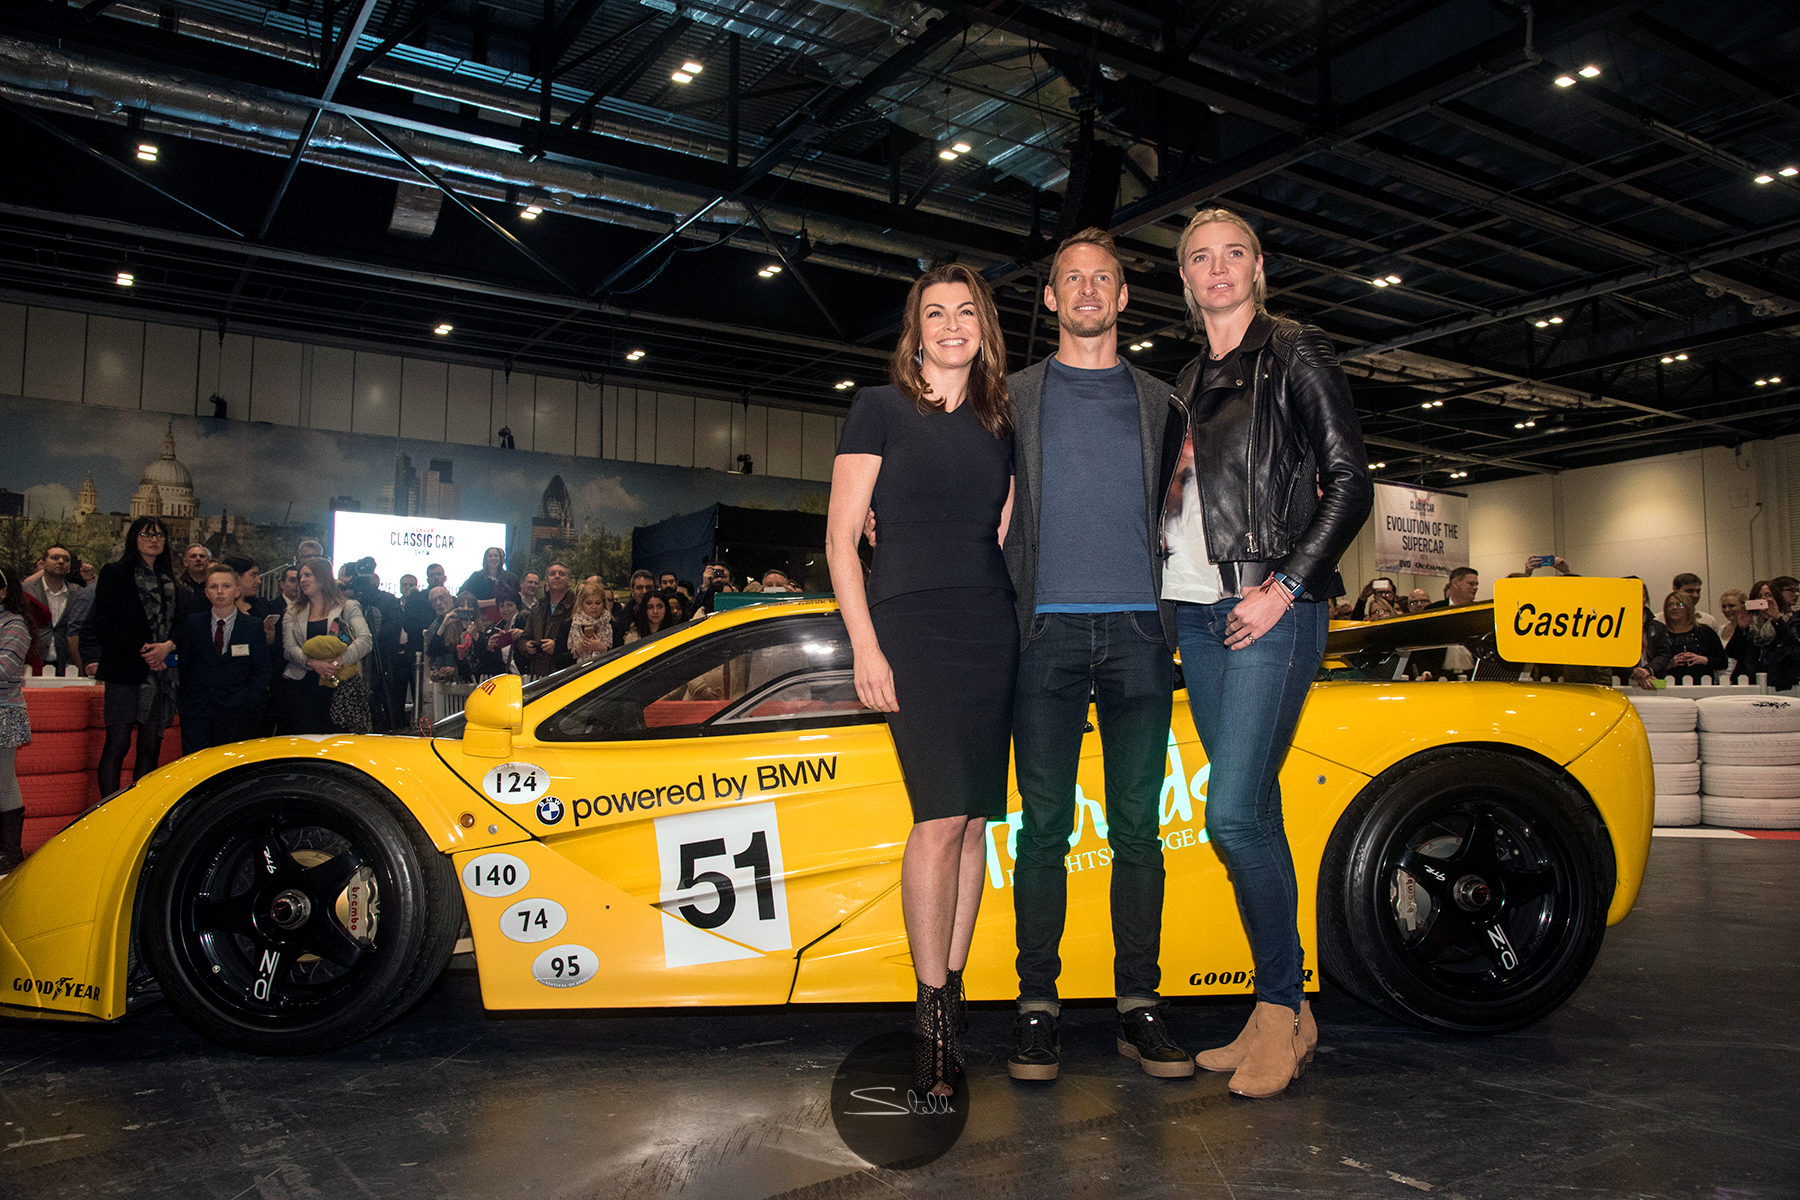 Stella Scordellis London Classic Car Show 2016 15 Watermarked.jpg